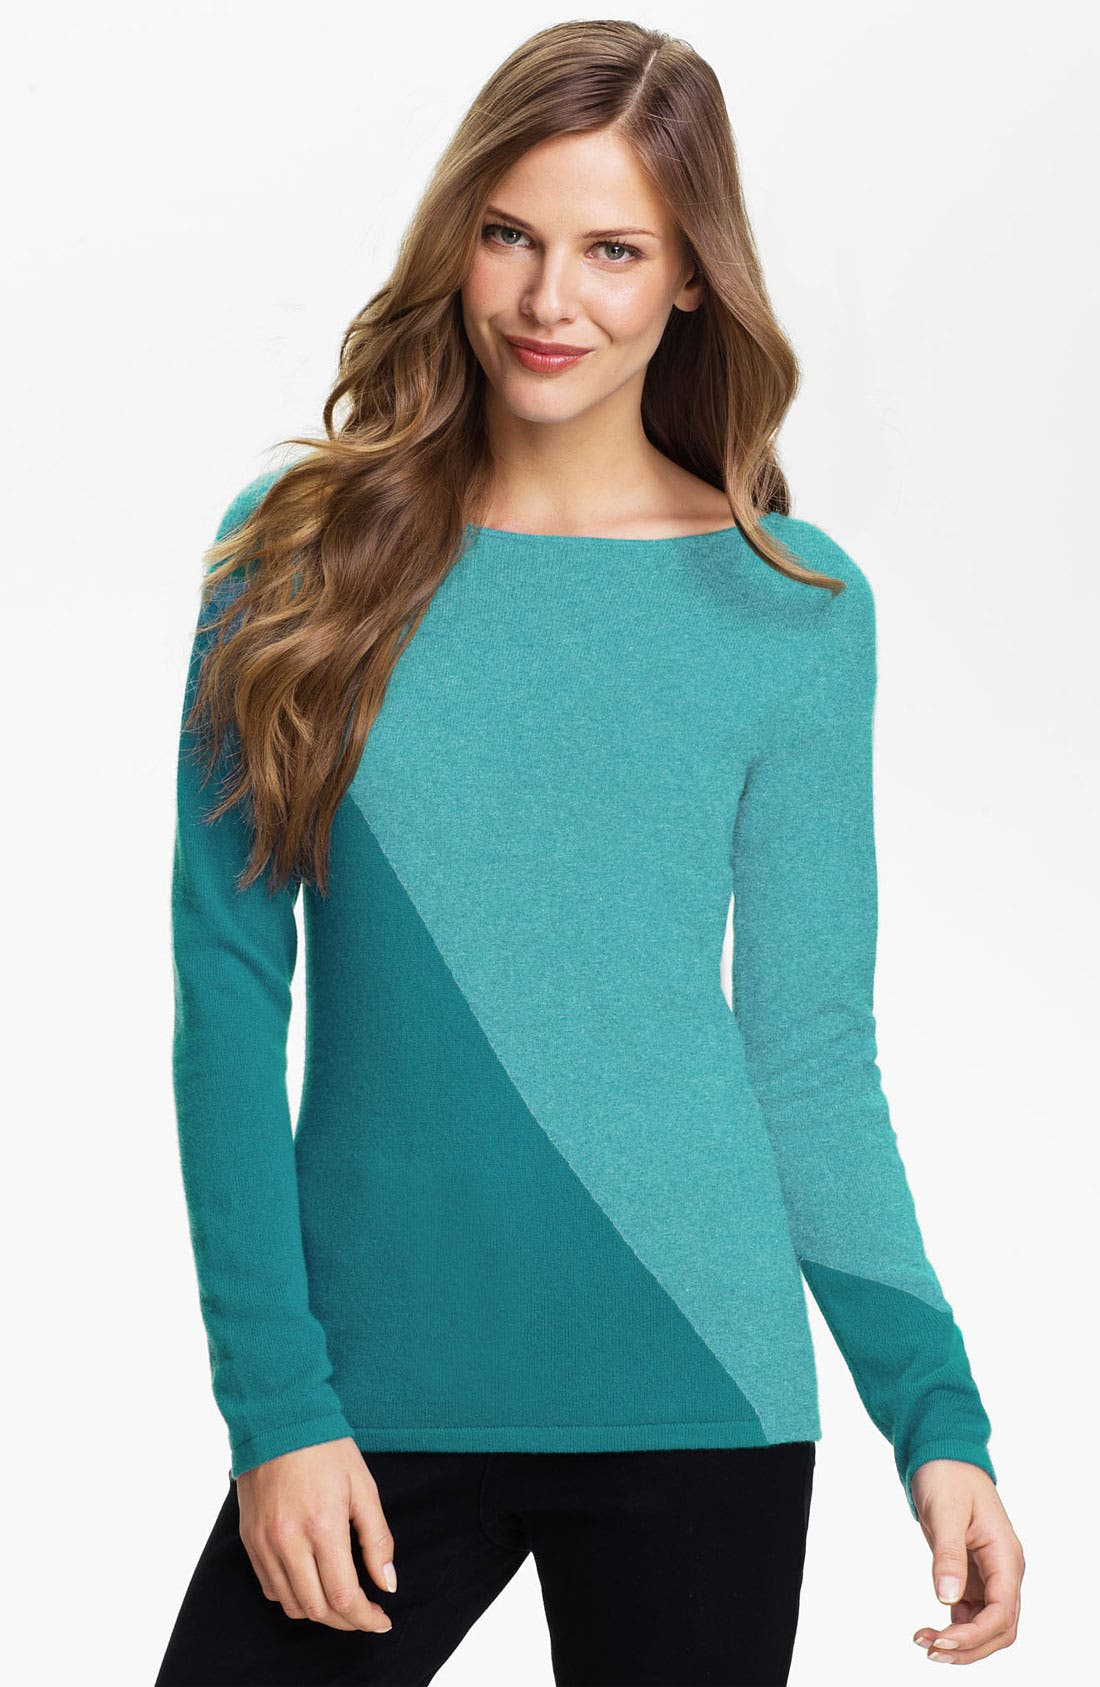 Main Image - Lauren Hansen Colorblock Cashmere Sweater